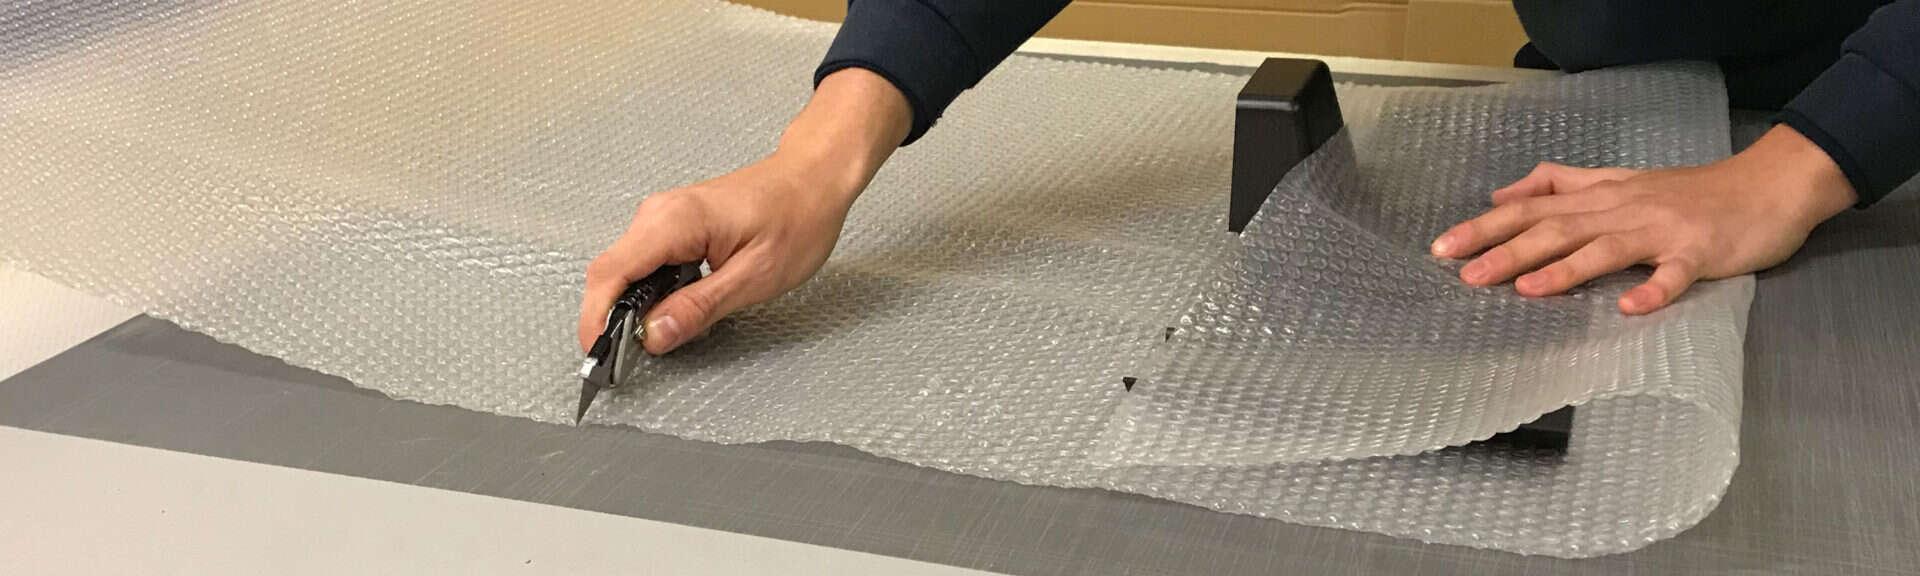 Worker Cutting Bubble Wrap